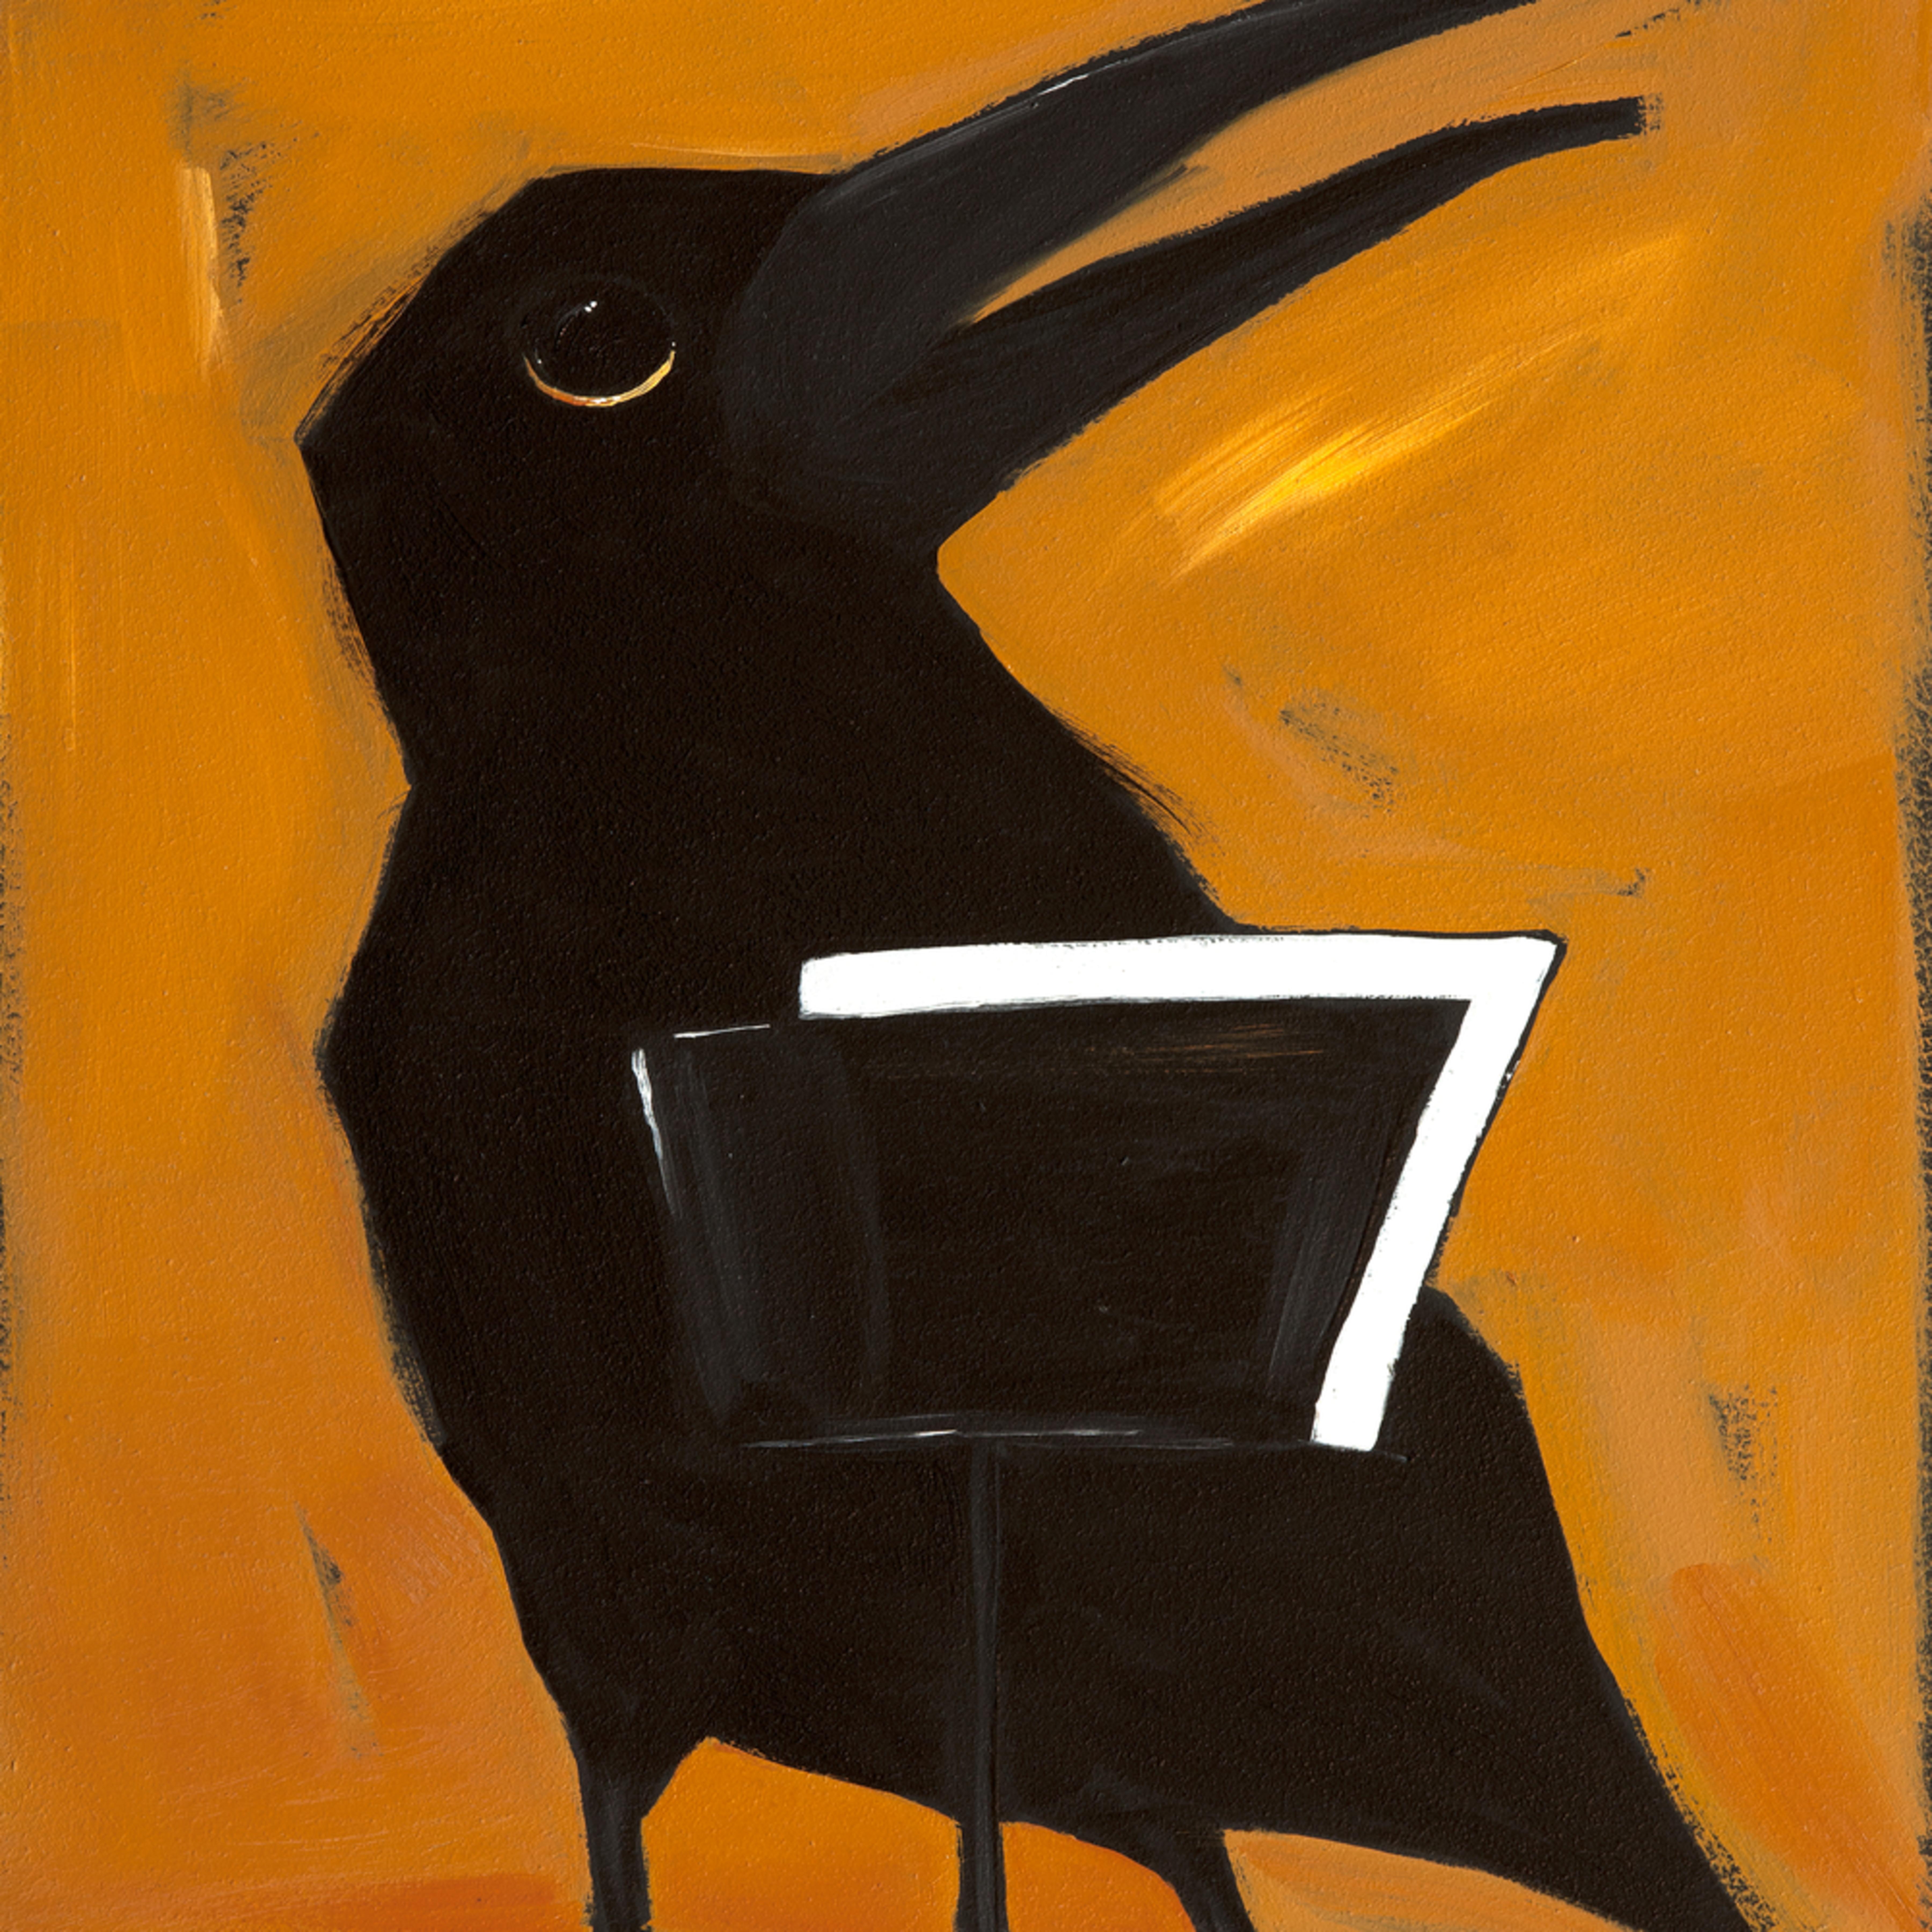 Songbird zhkhhc